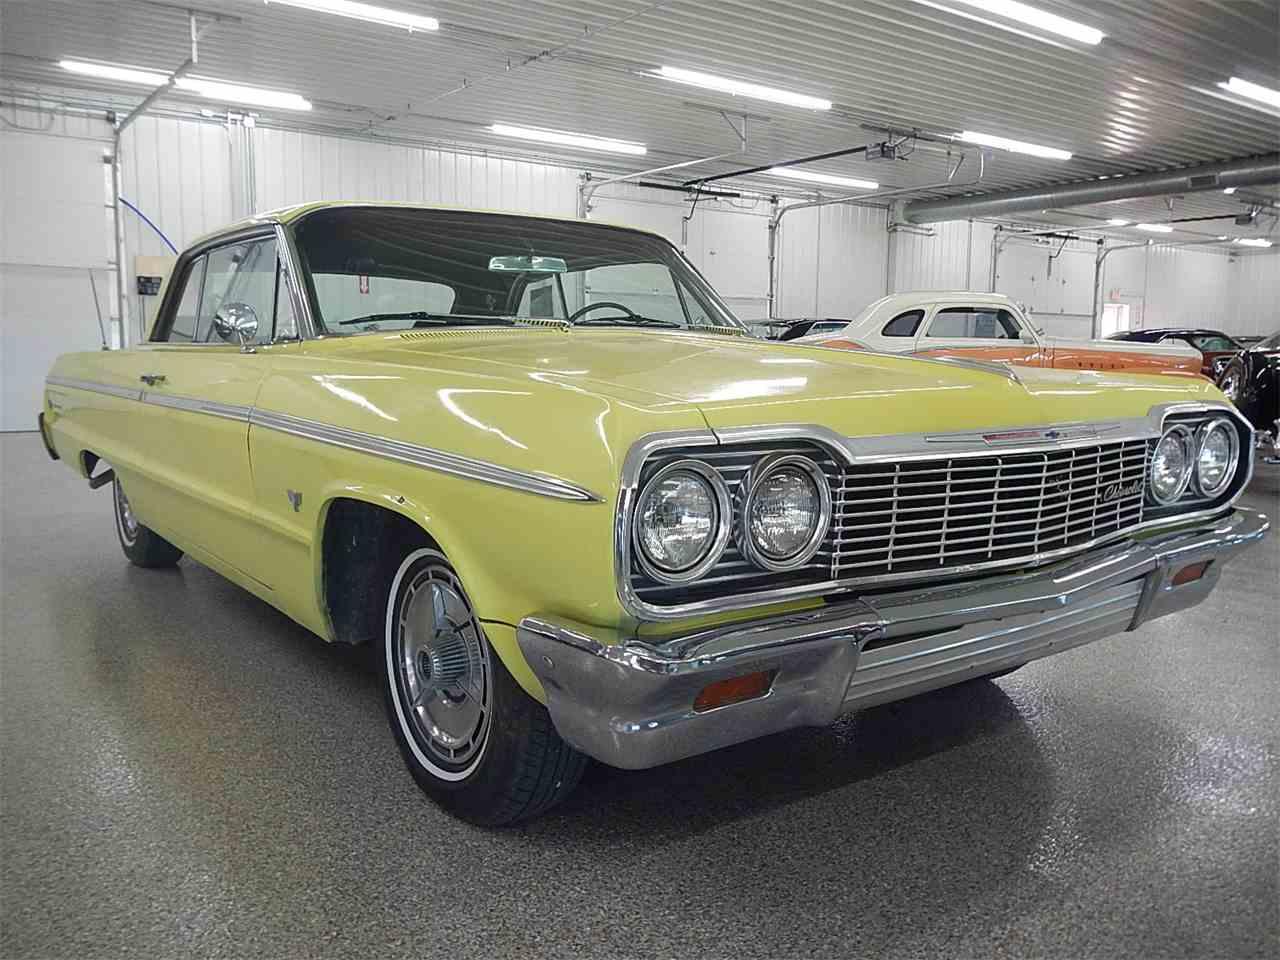 1964 chevrolet impala ss for sale cc 957739. Black Bedroom Furniture Sets. Home Design Ideas